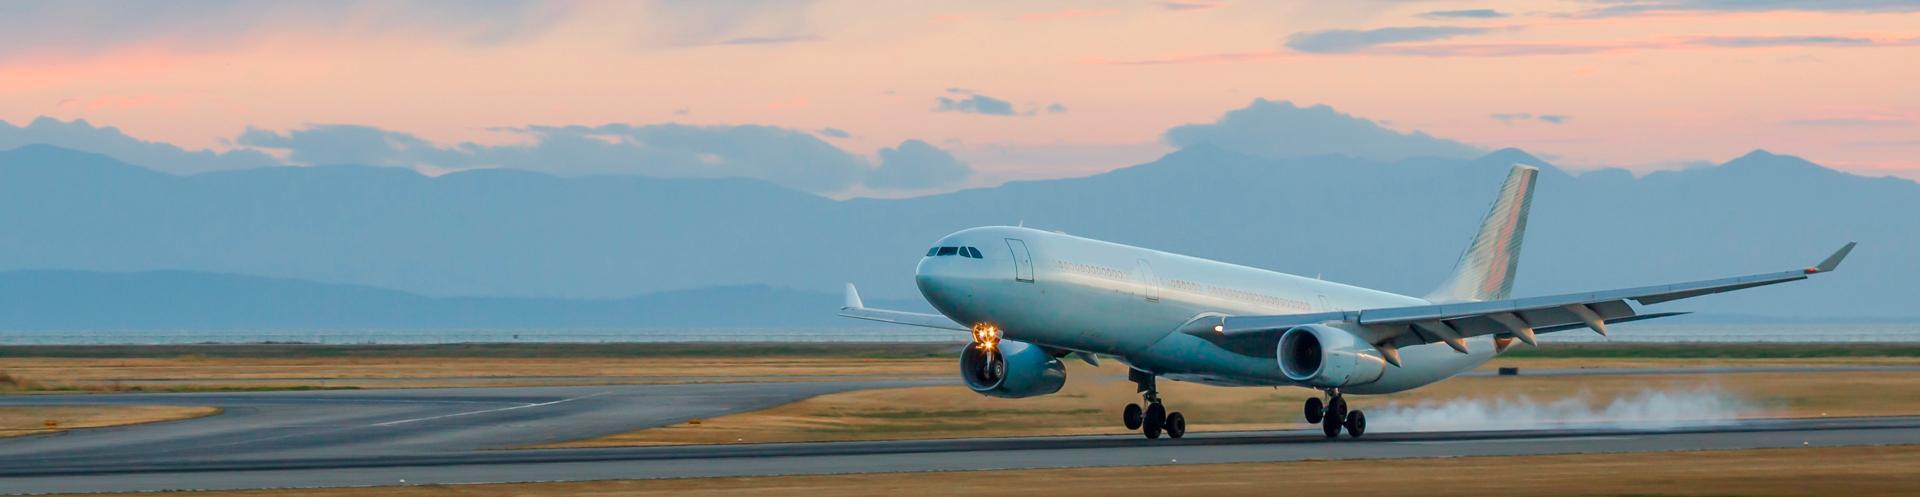 Takeoff with RCHSS Travel